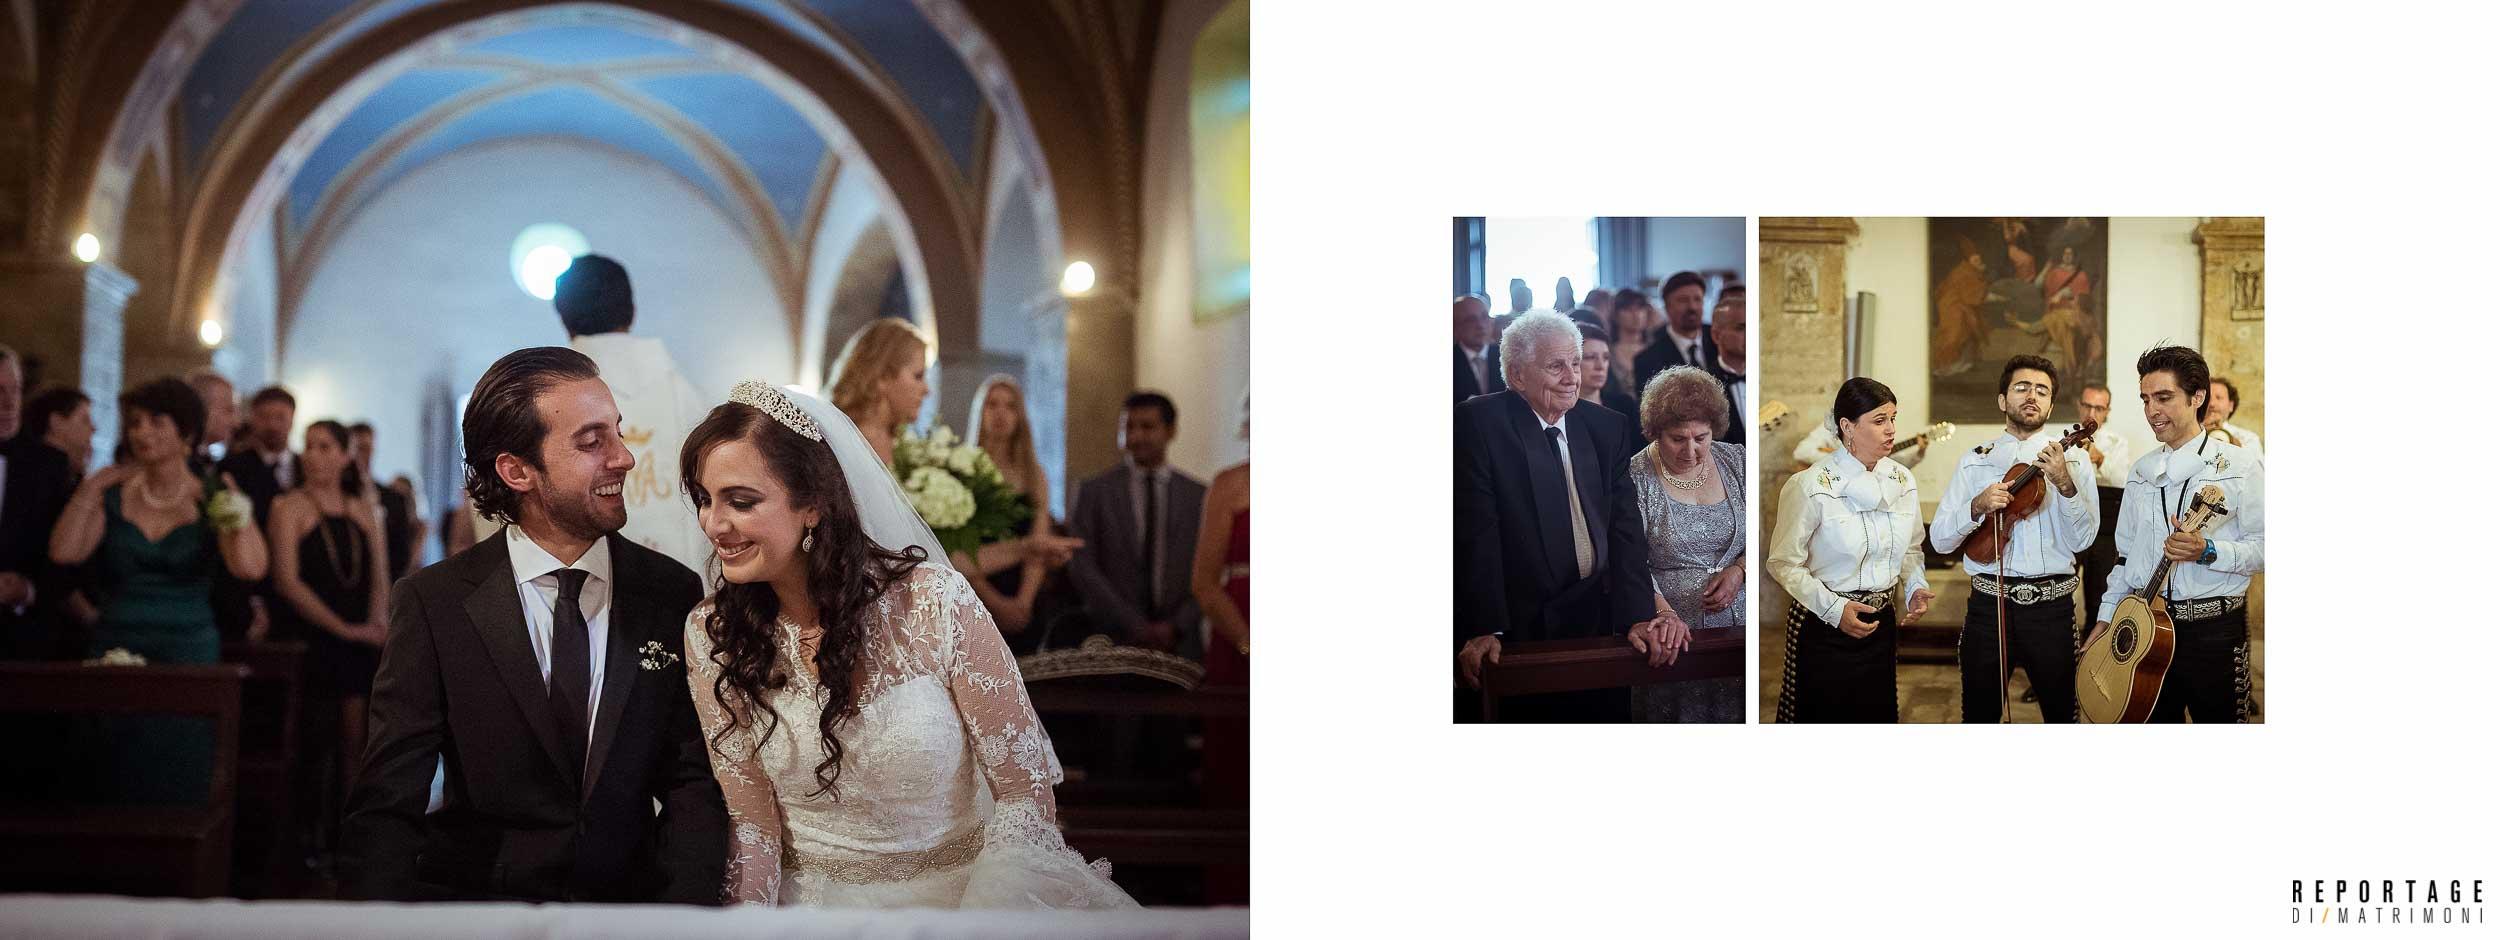 labro_wedding9